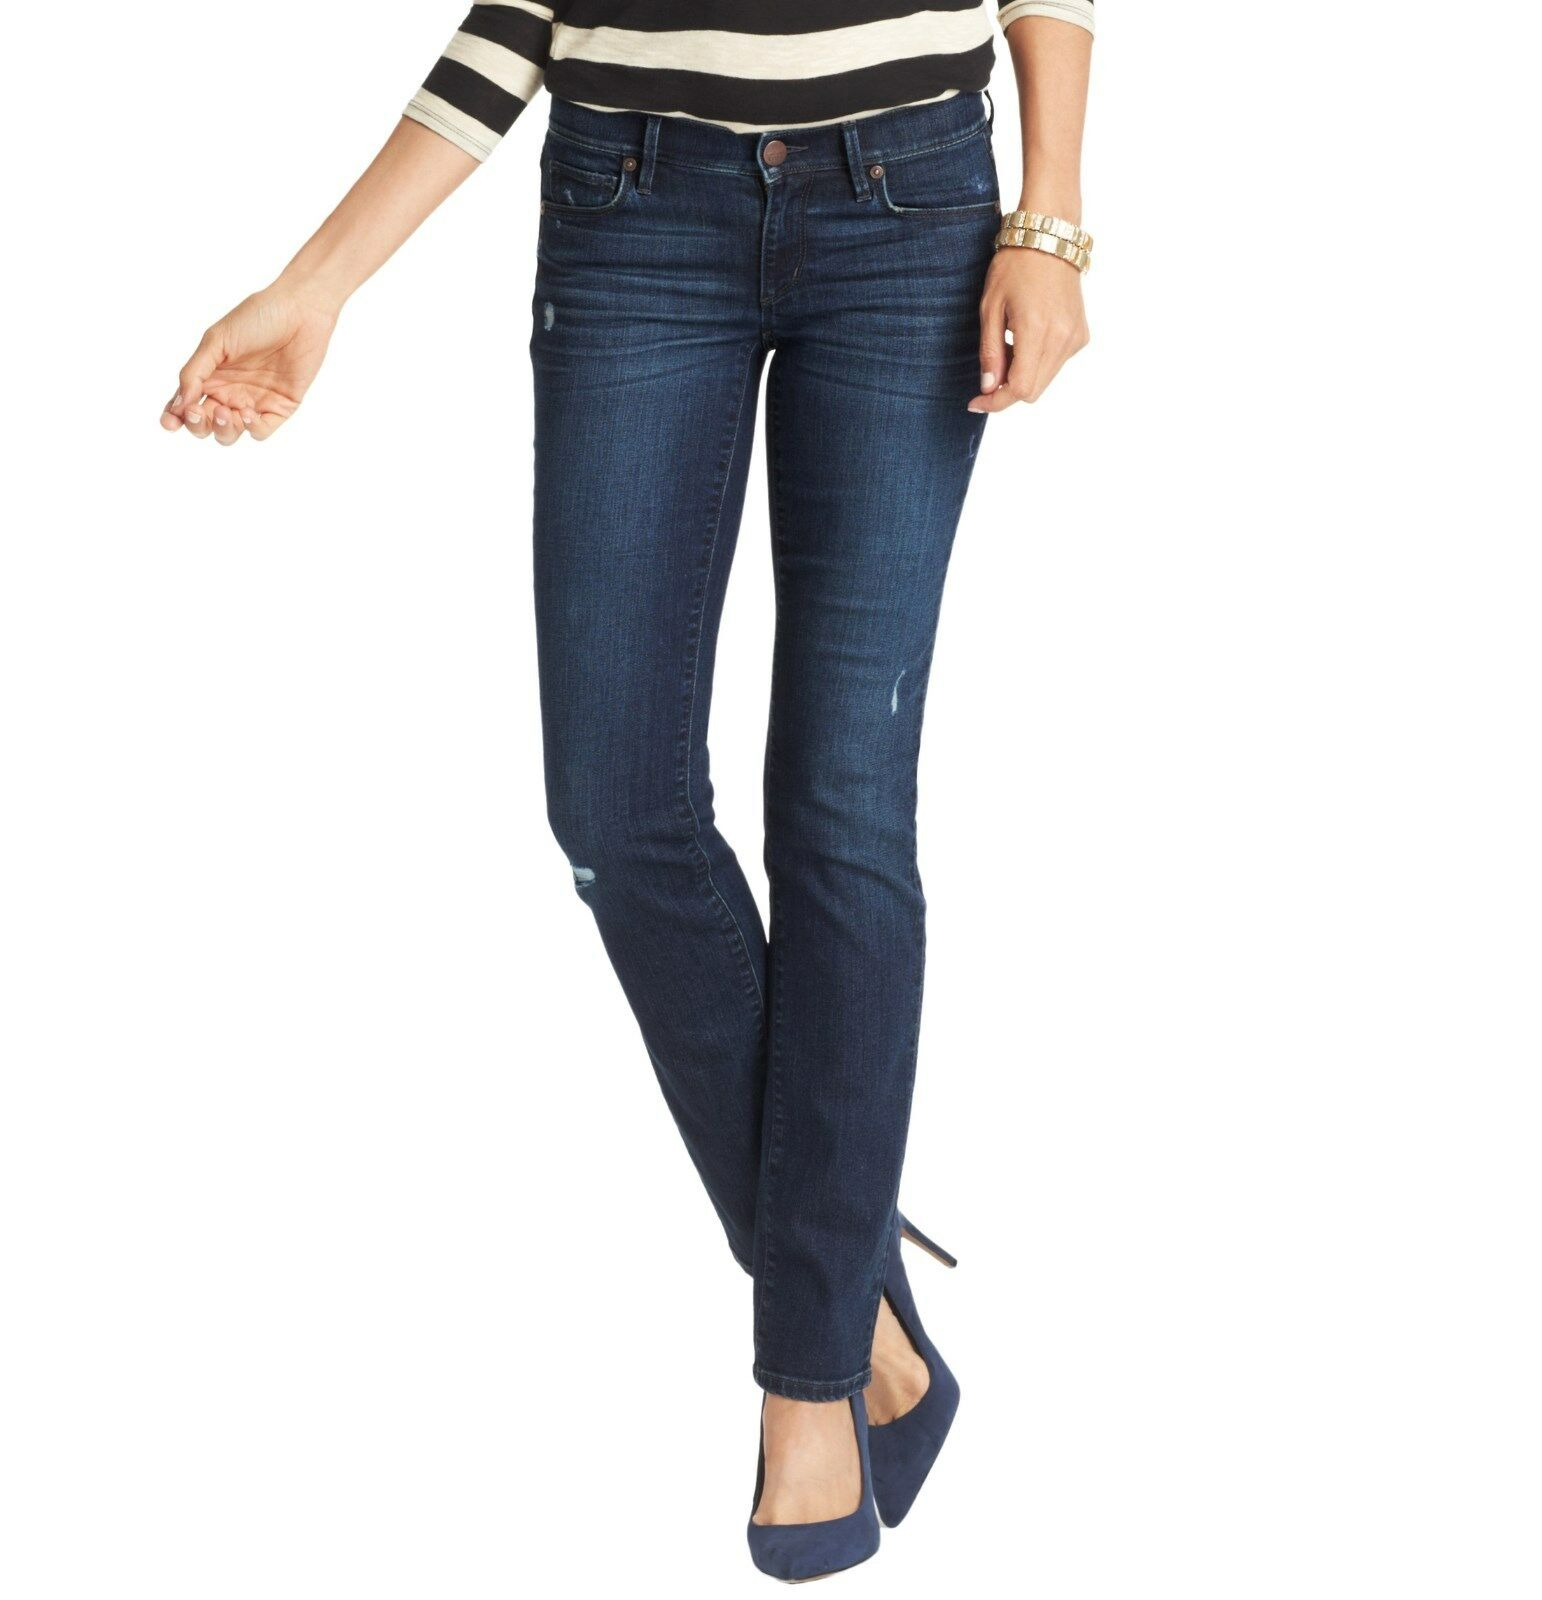 NWT Ann Taylor Loft Modern Straight Leg Distressed Jeans, Size 0 a